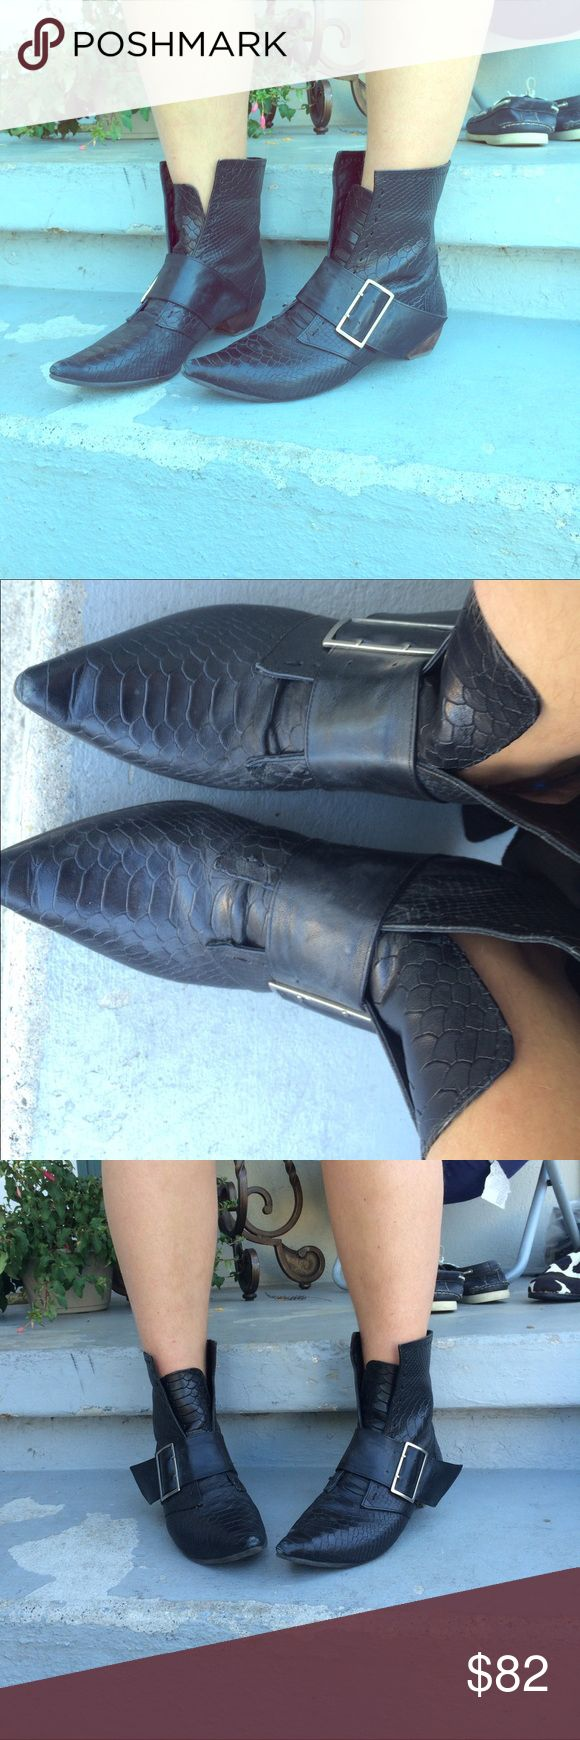 Beautiful brand new John Fluevog boots! Beautiful barely worn John Fluevog boots with buckle. John Fluevog  Shoes Ankle Boots & Booties